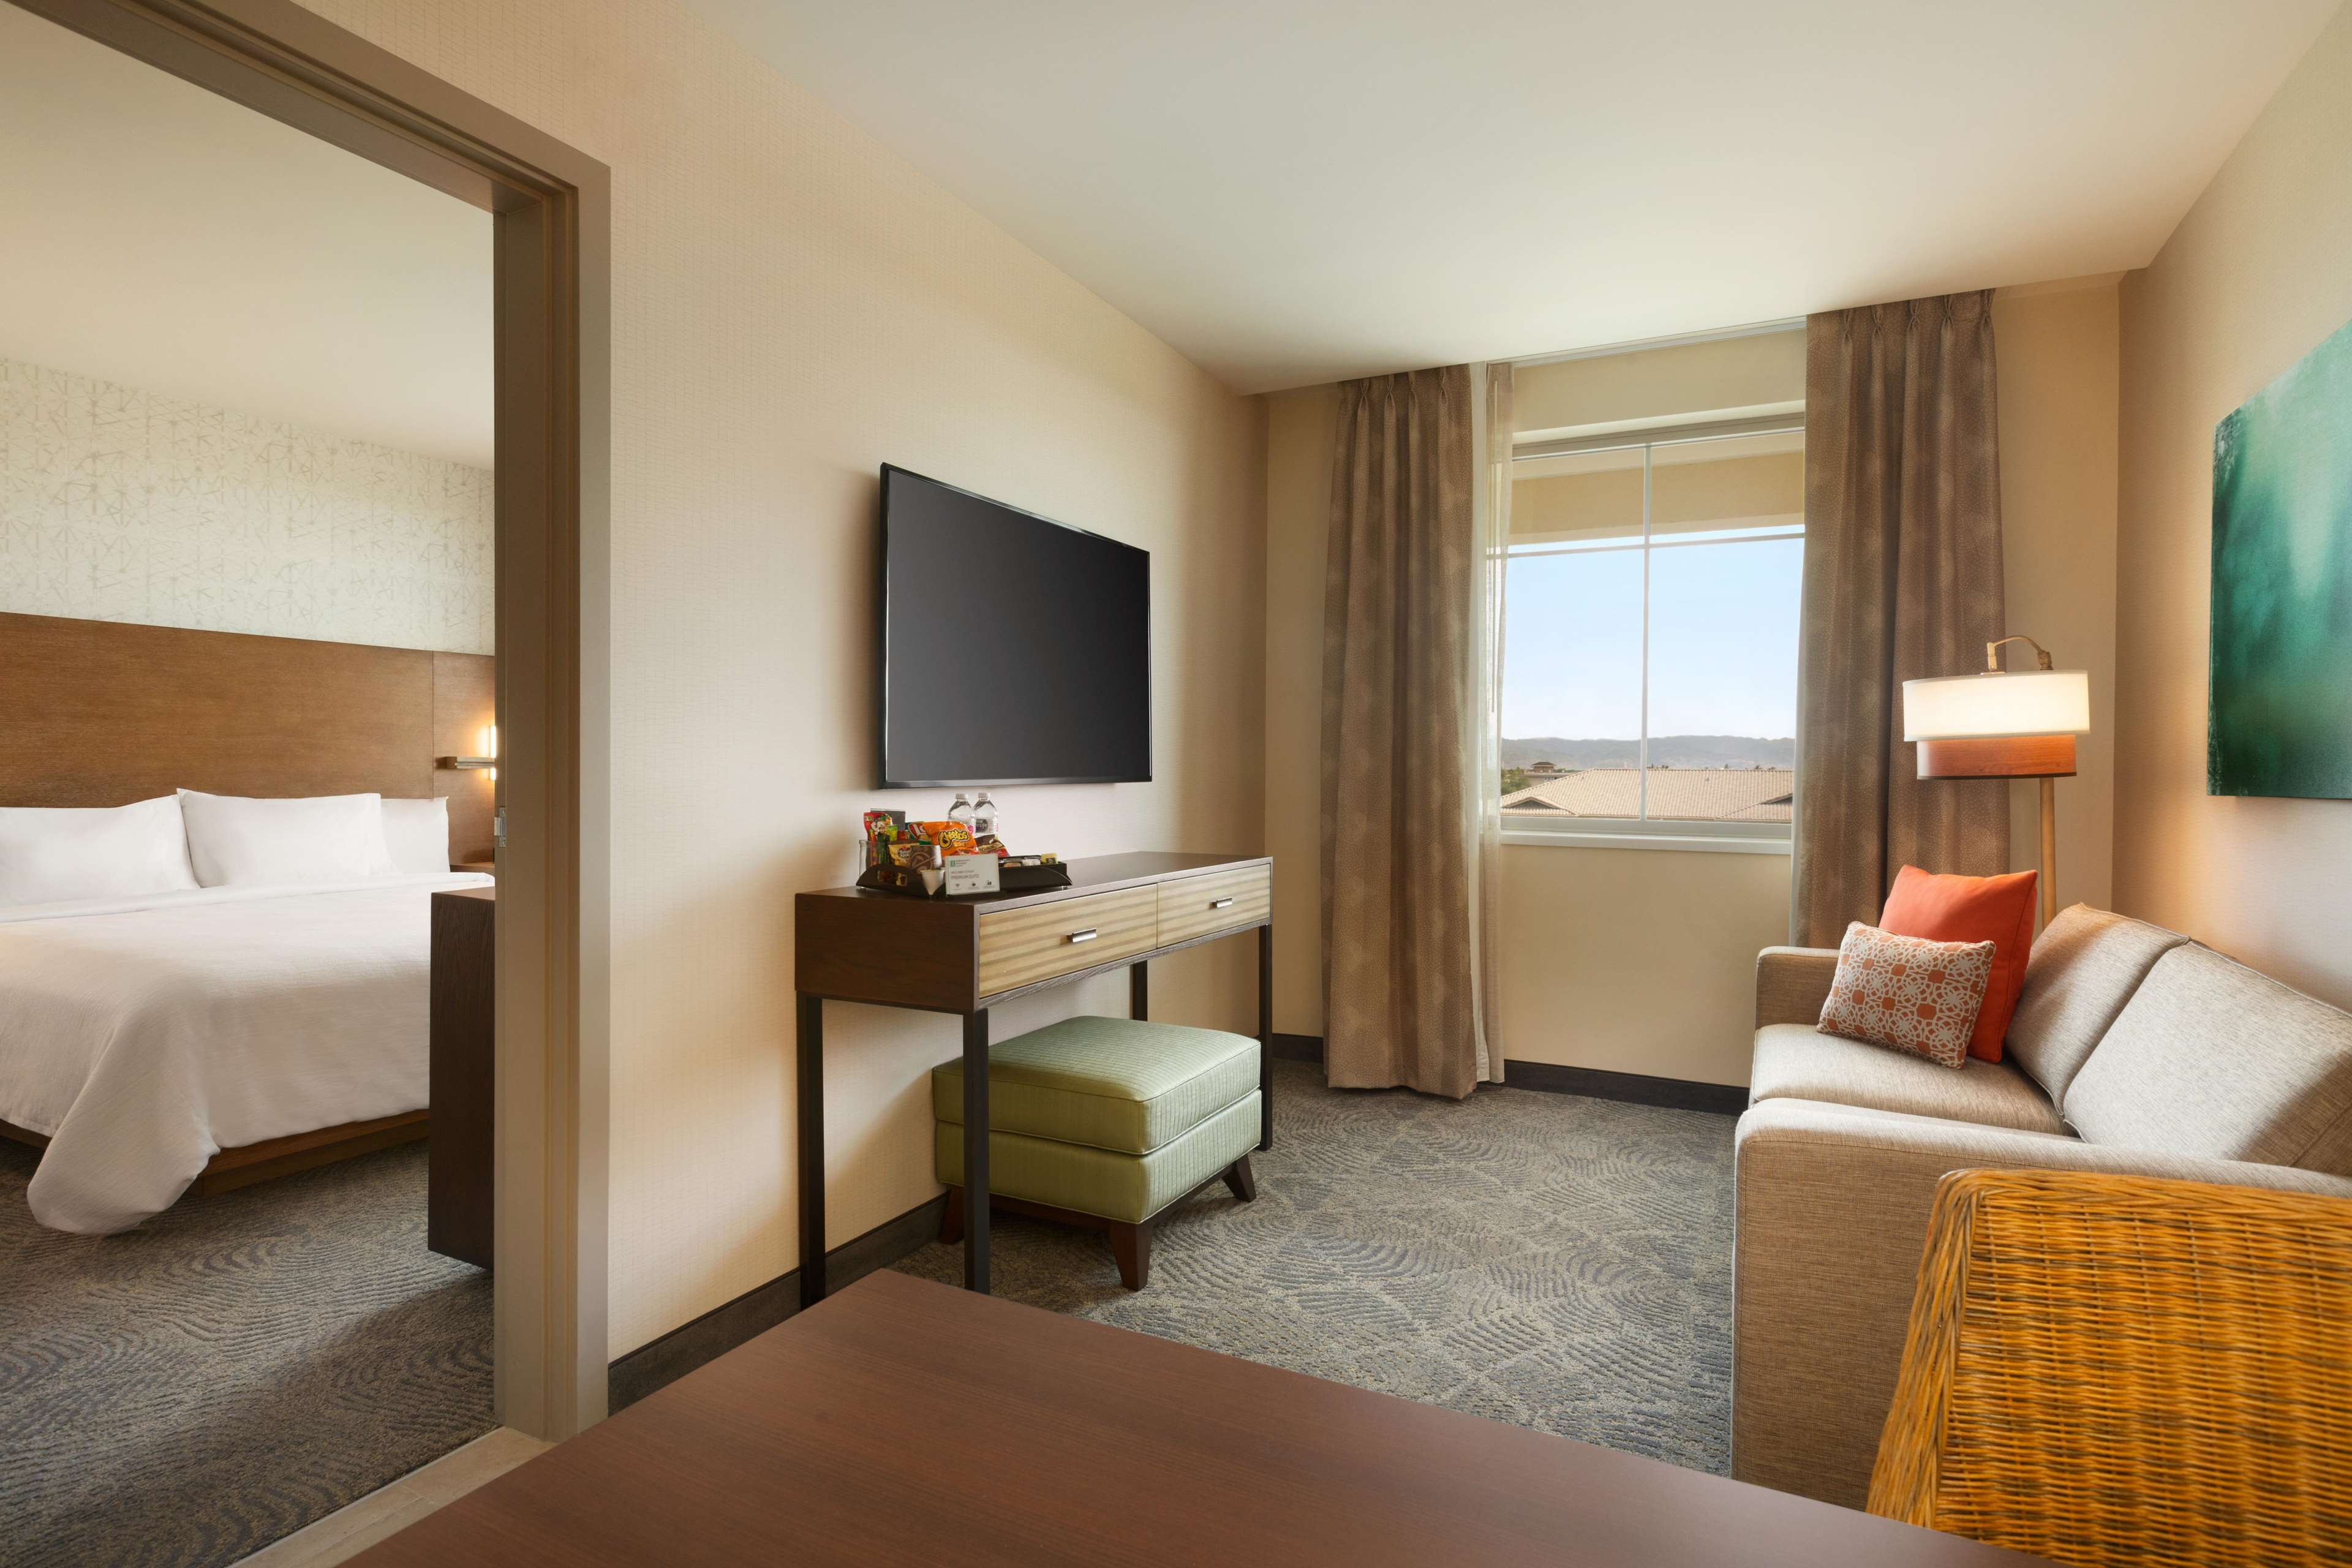 Embassy Suites by Hilton Oahu Kapolei image 25